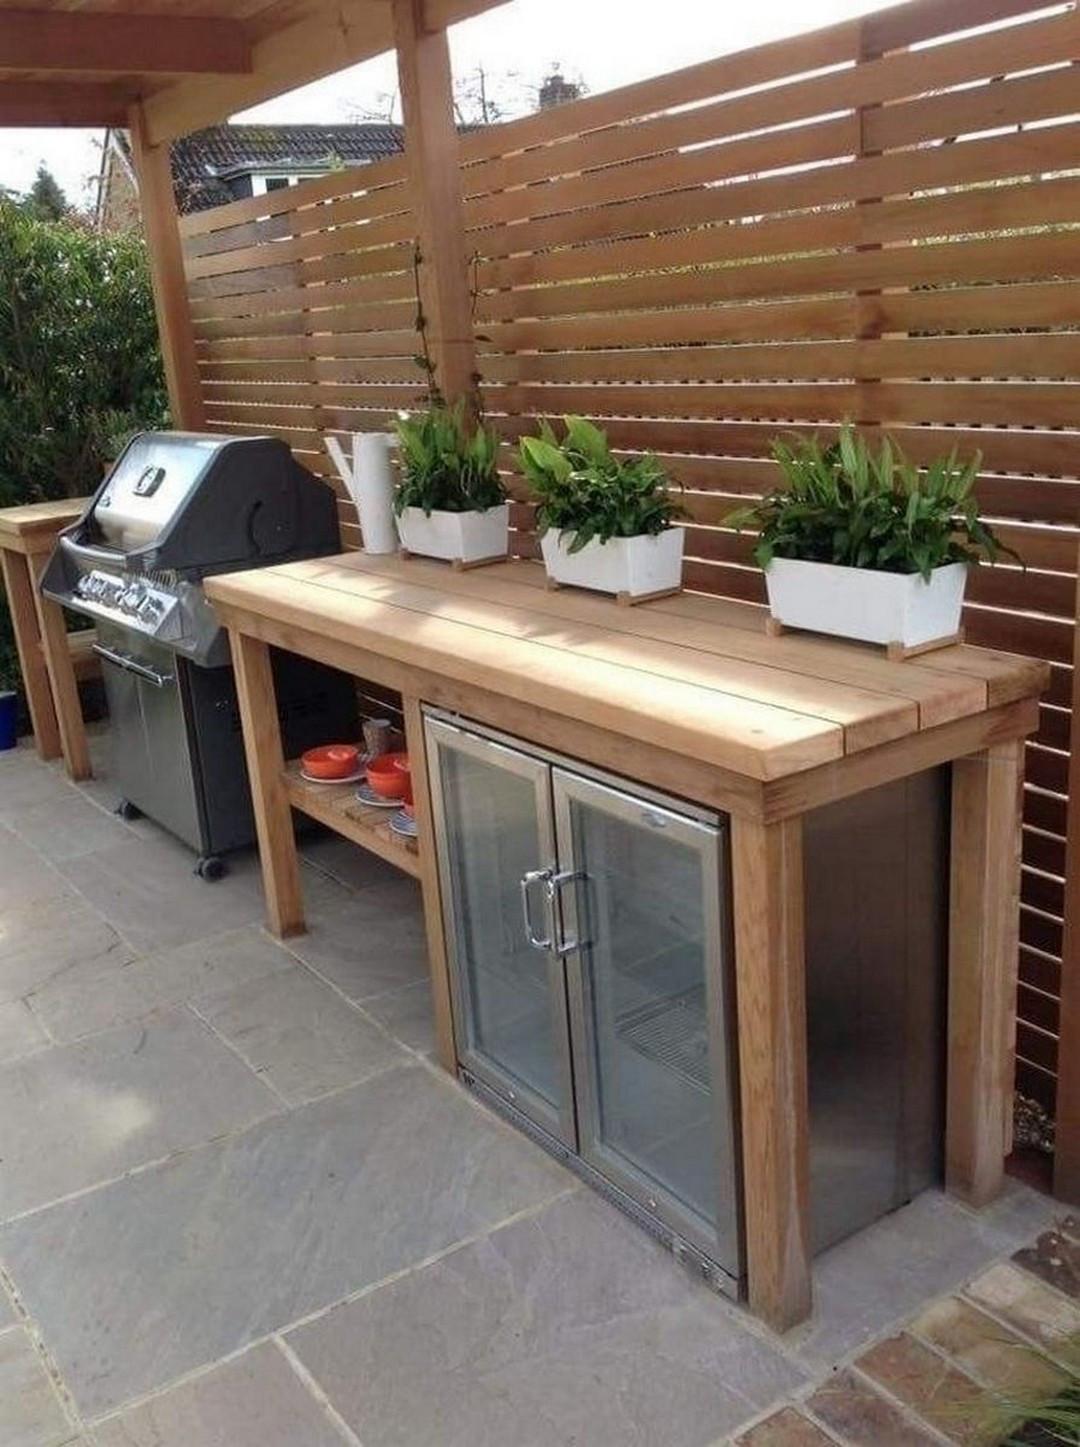 Diy Outdoor Kitchen Ideas  Best Diy Outdoor Kitchen Ideas And Designs House & Living